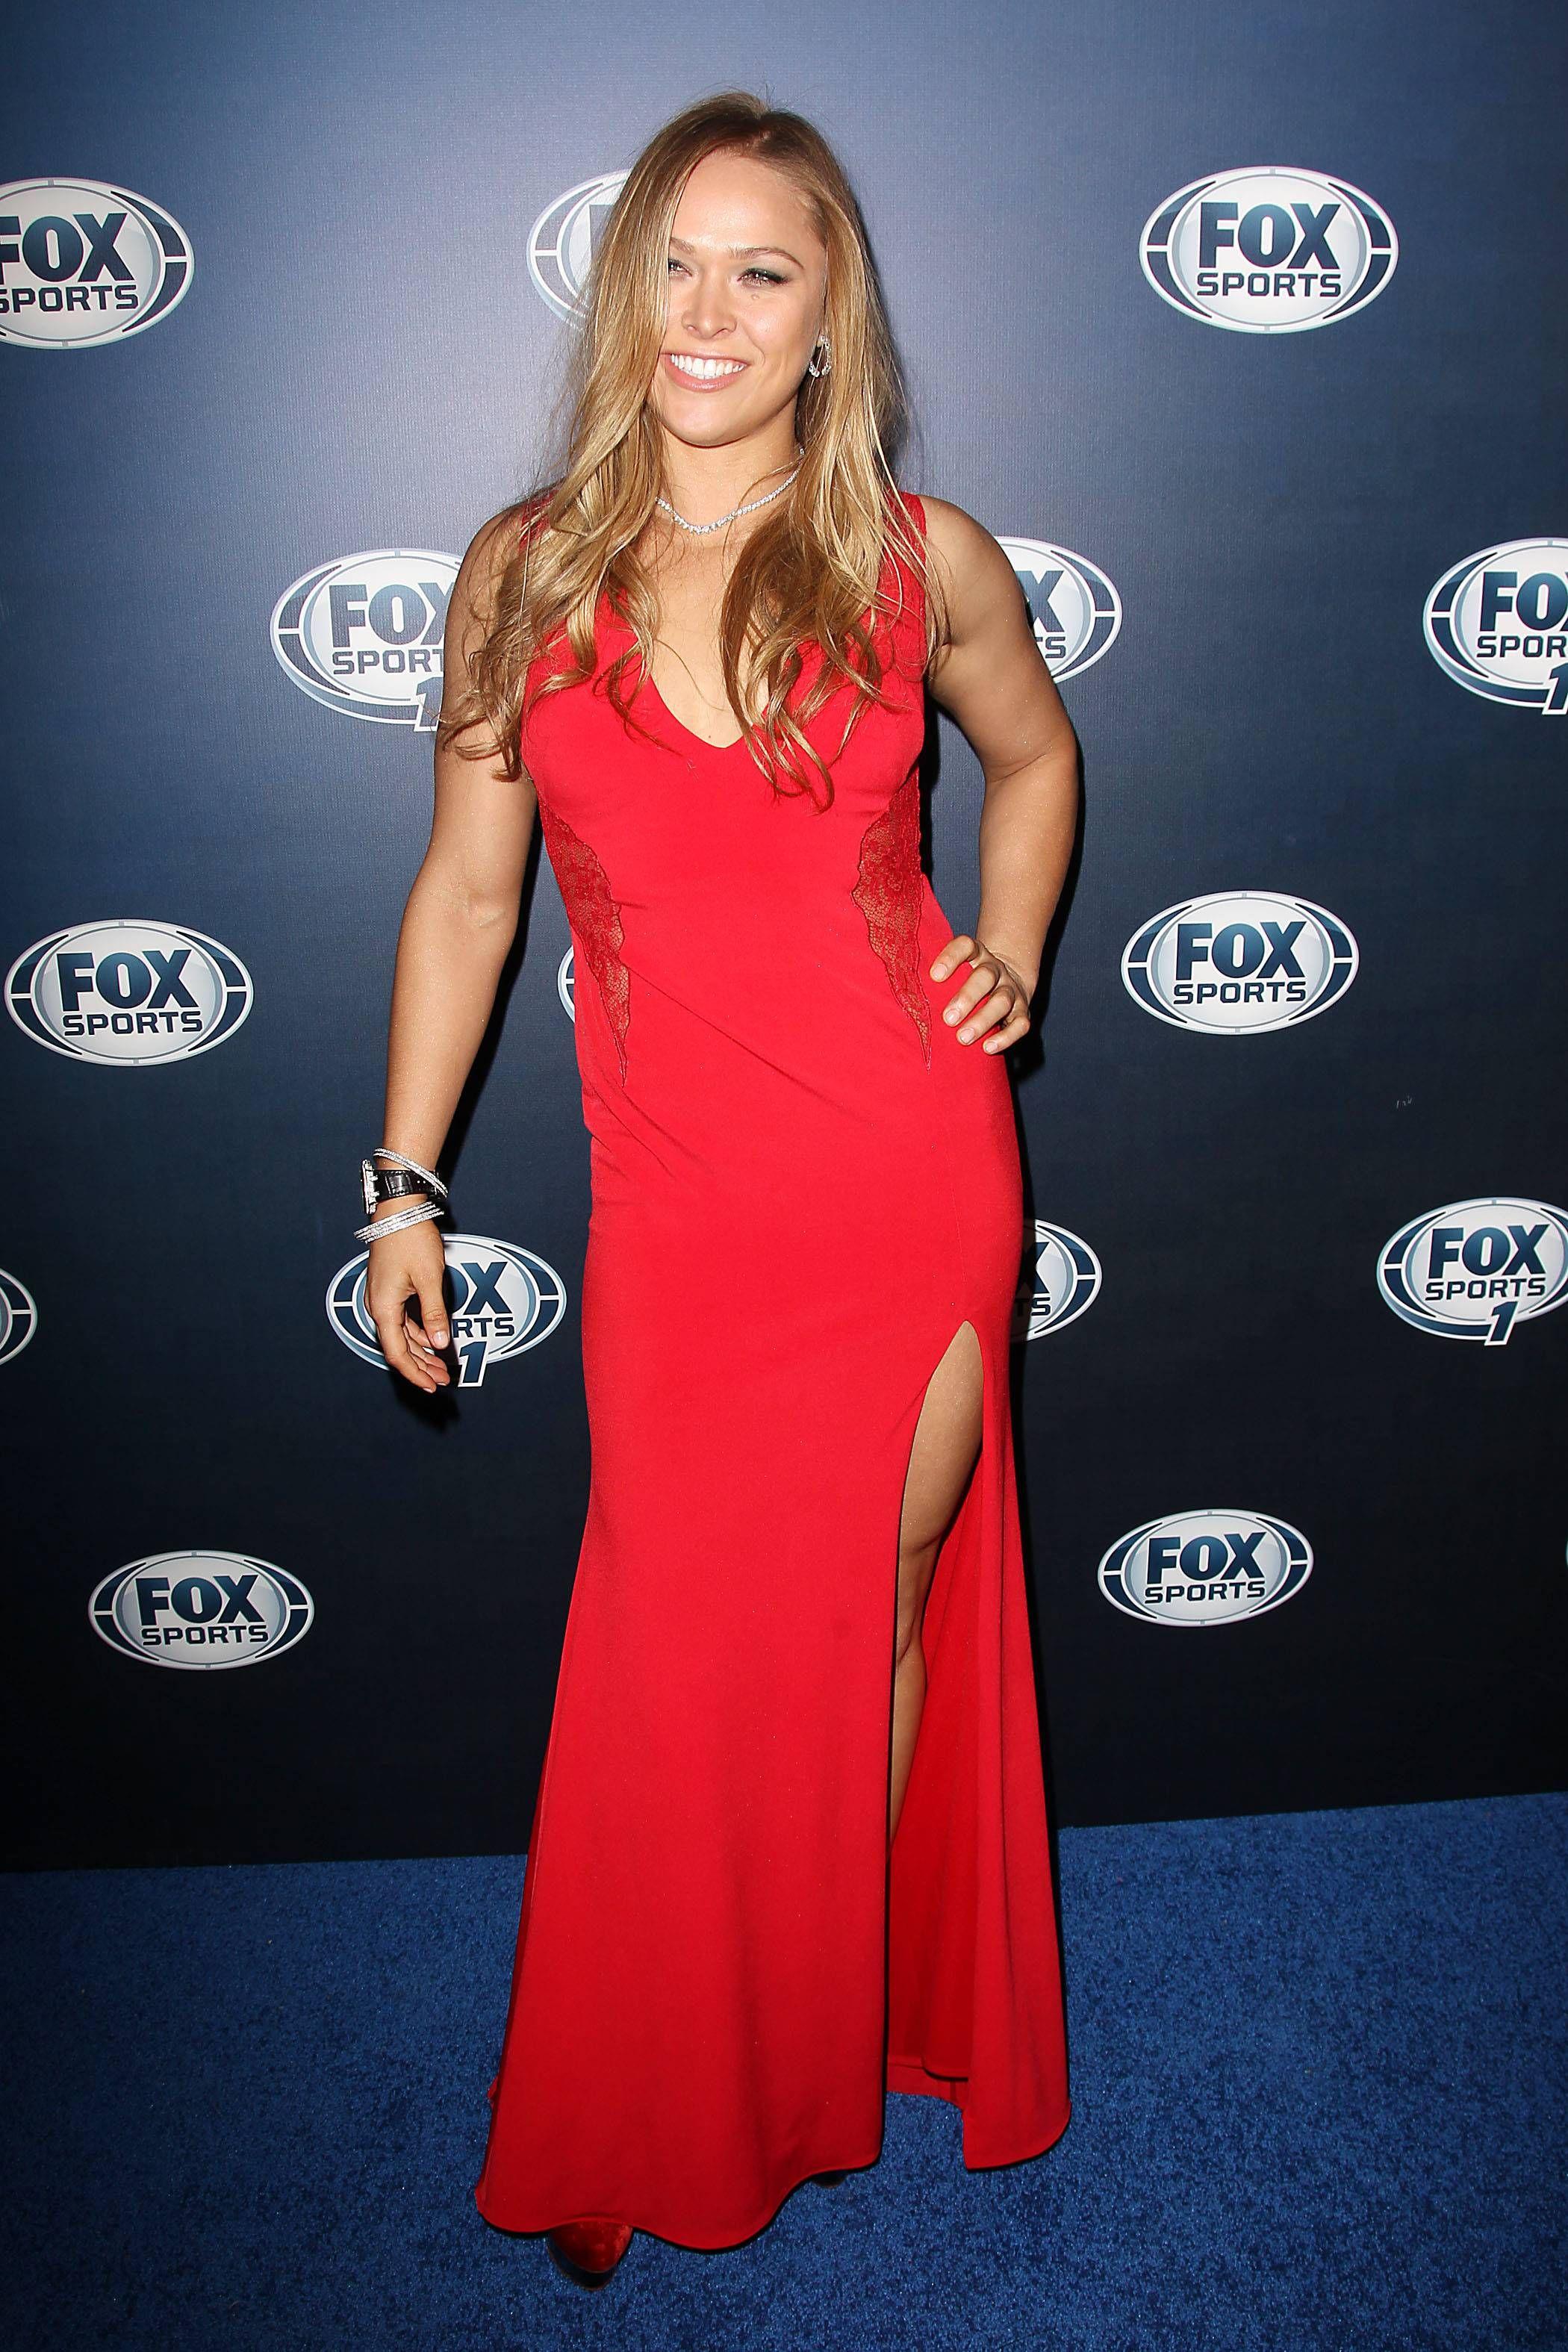 Ronda Rousey Expendables 3 Ronda Rousey Ufc Women Mma Women